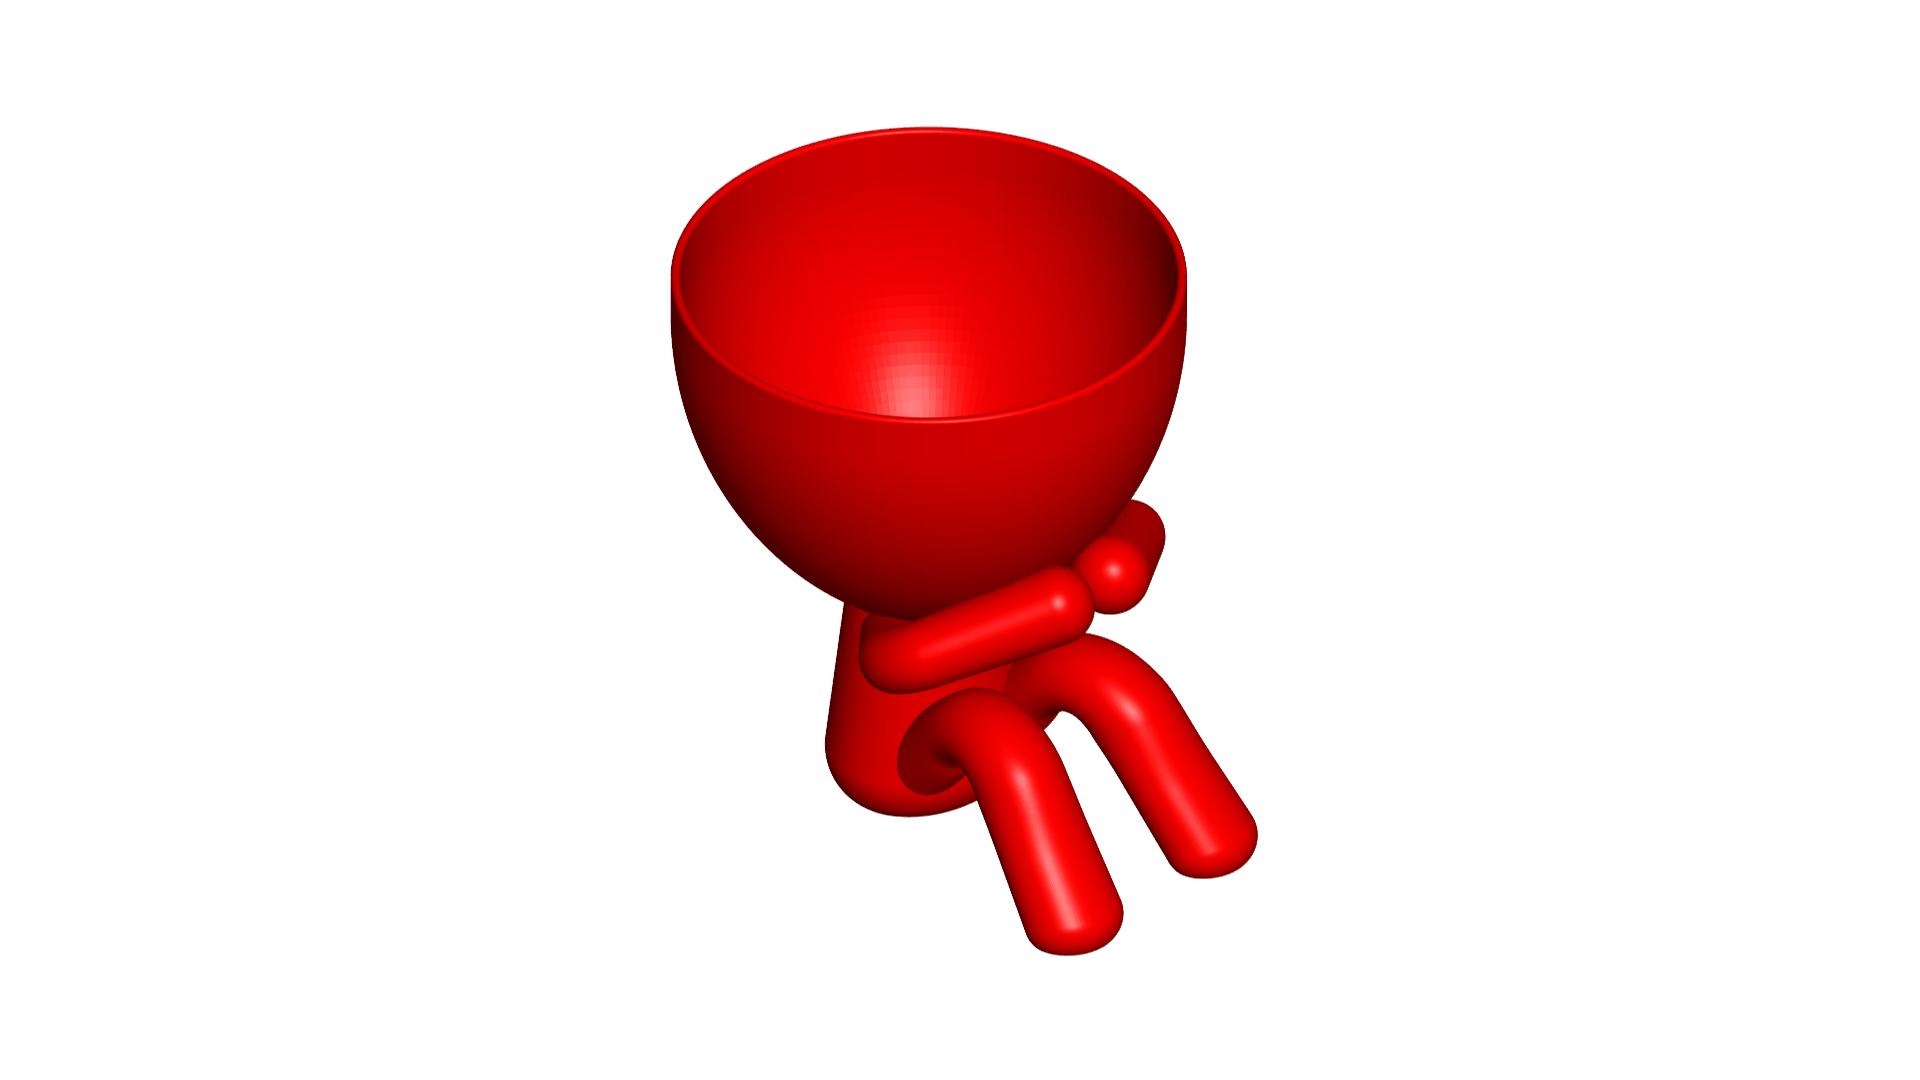 3_rojo_2.png Download free STL file MACETA FLORERO ROBERT PLANT - POT GLASS ROBERT WISE I DO NOT SPEAK • 3D printer design, PRODUSTL56